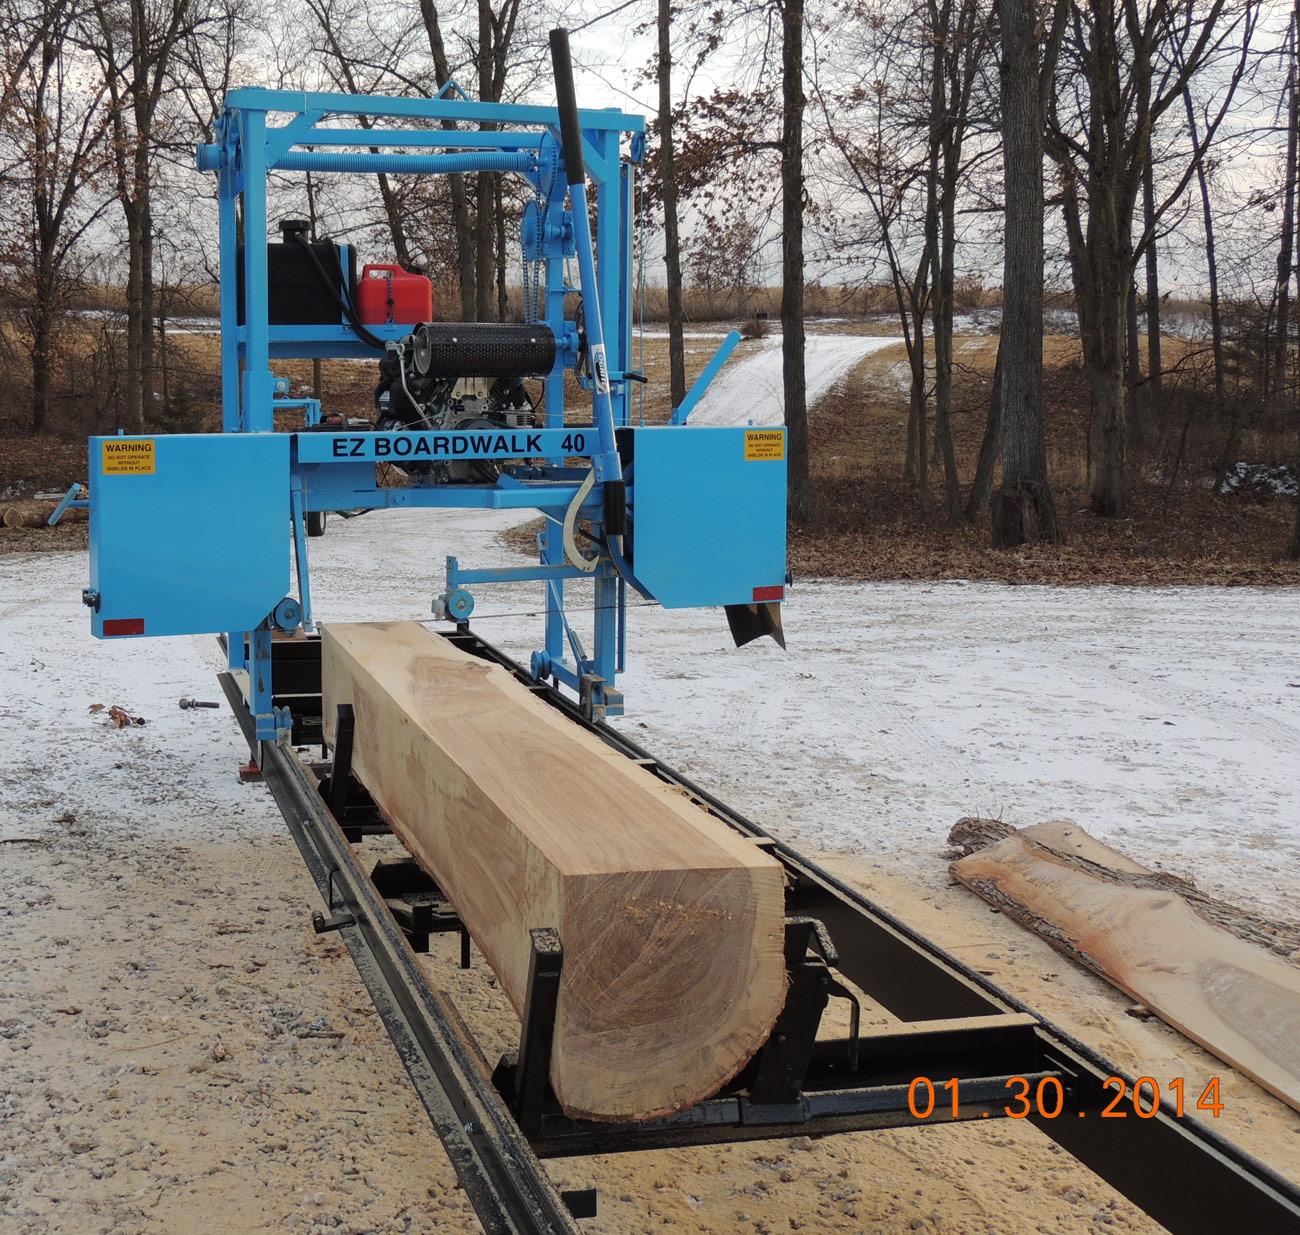 EZ Boardwalk Sawmill